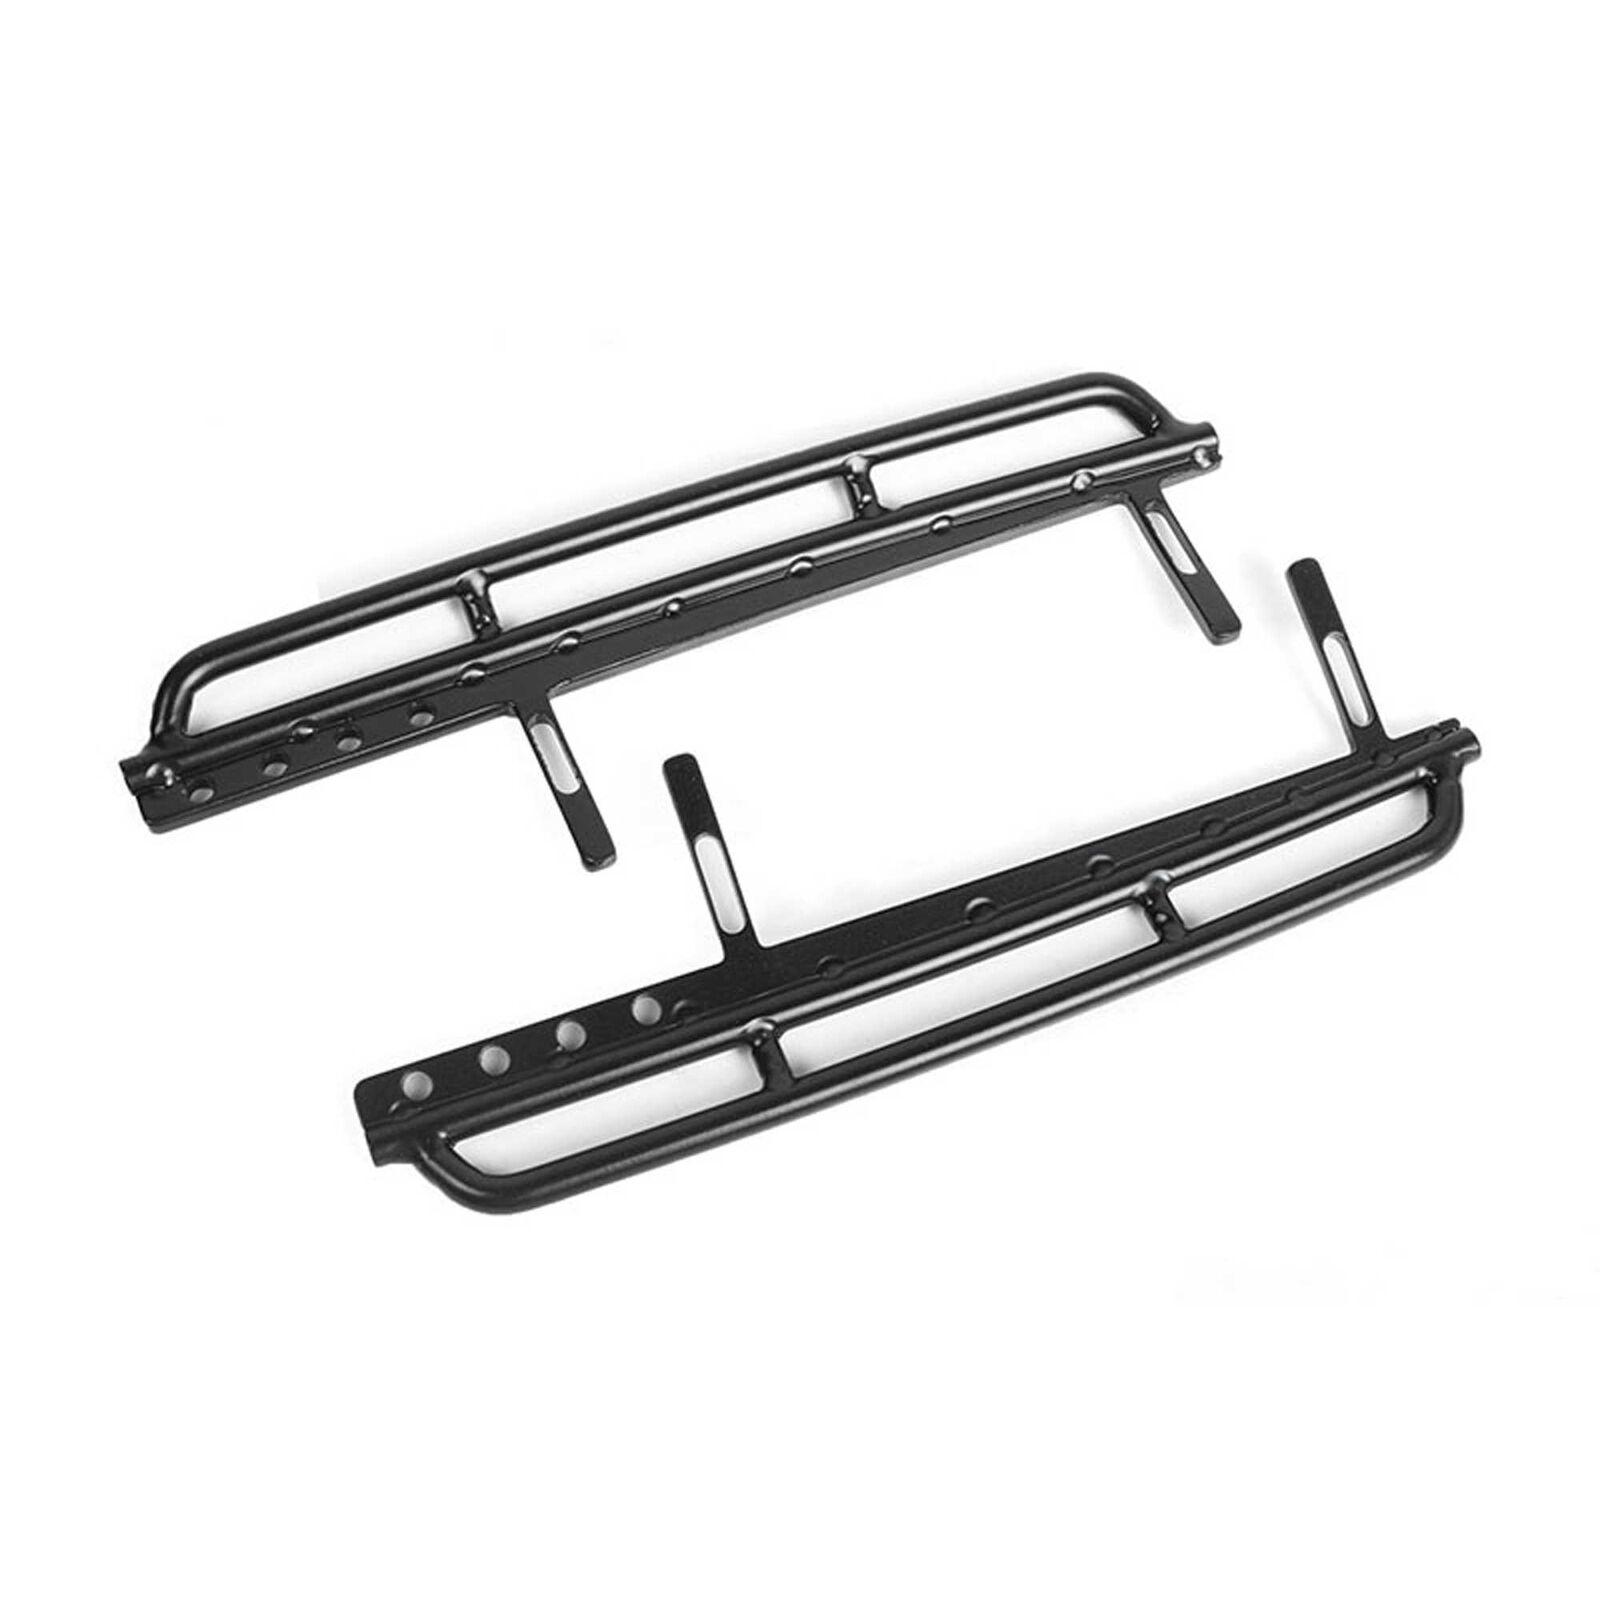 Metal Side Slider: Axial SCX10 III JLU Wrangler